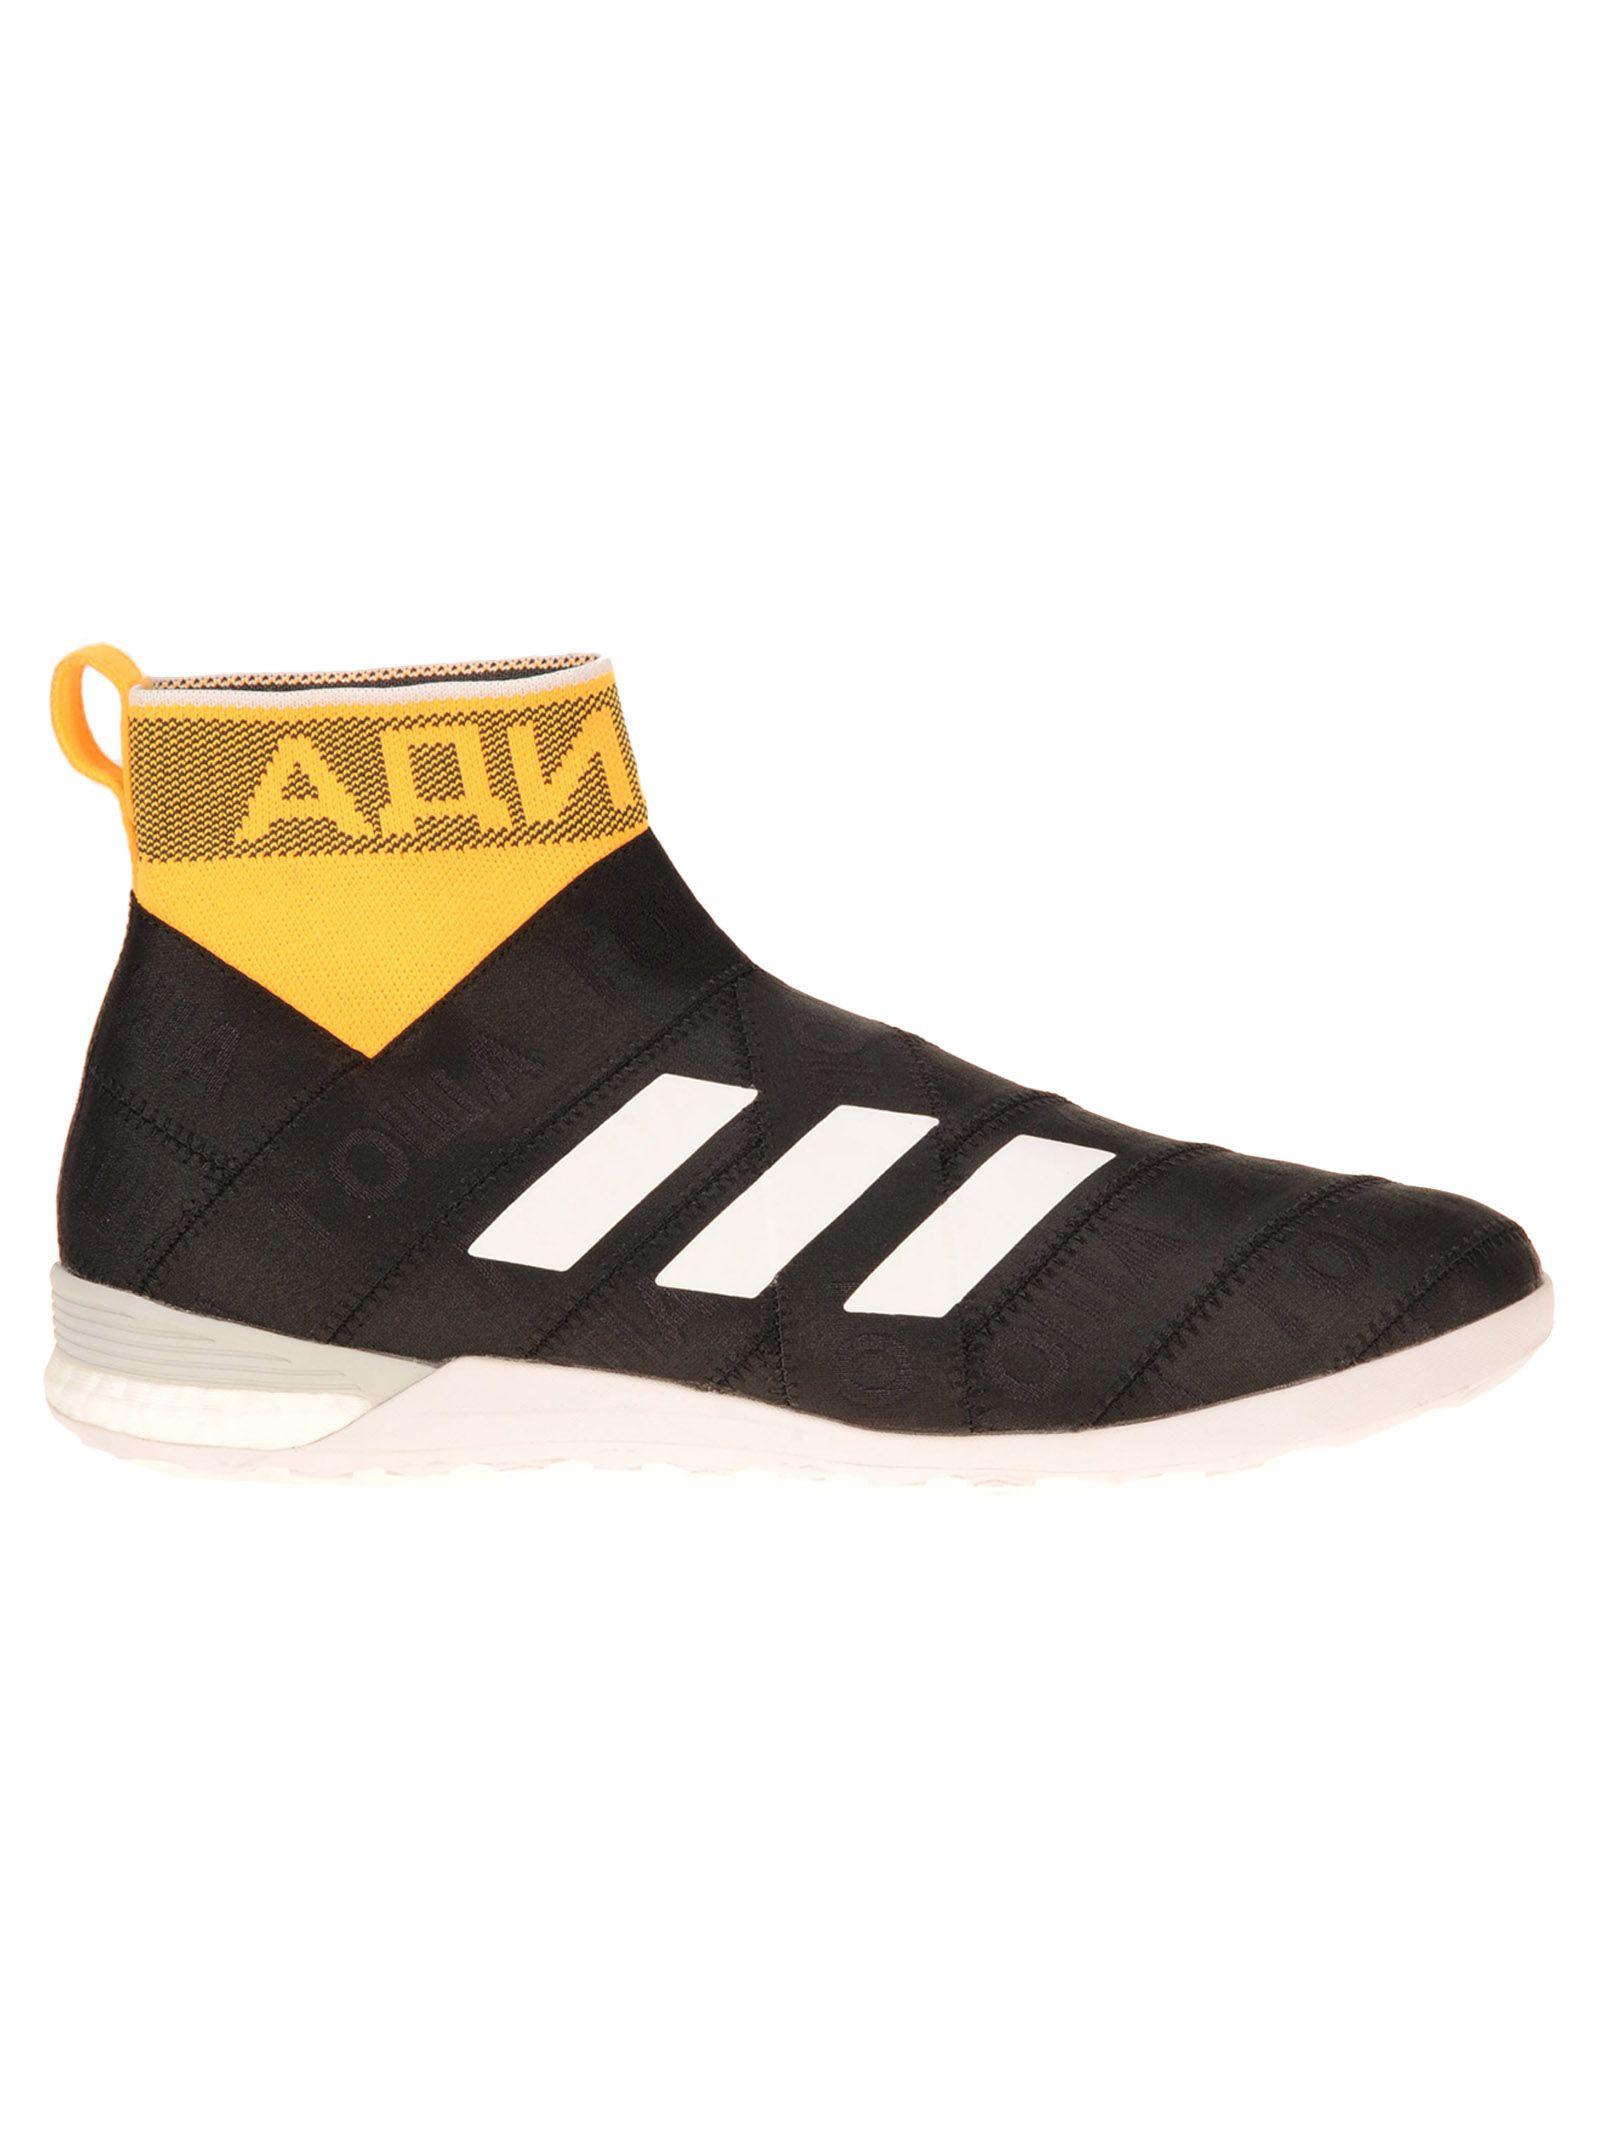 Gosha Rubchinskiy Adidas Nmz Sneaker 10562221